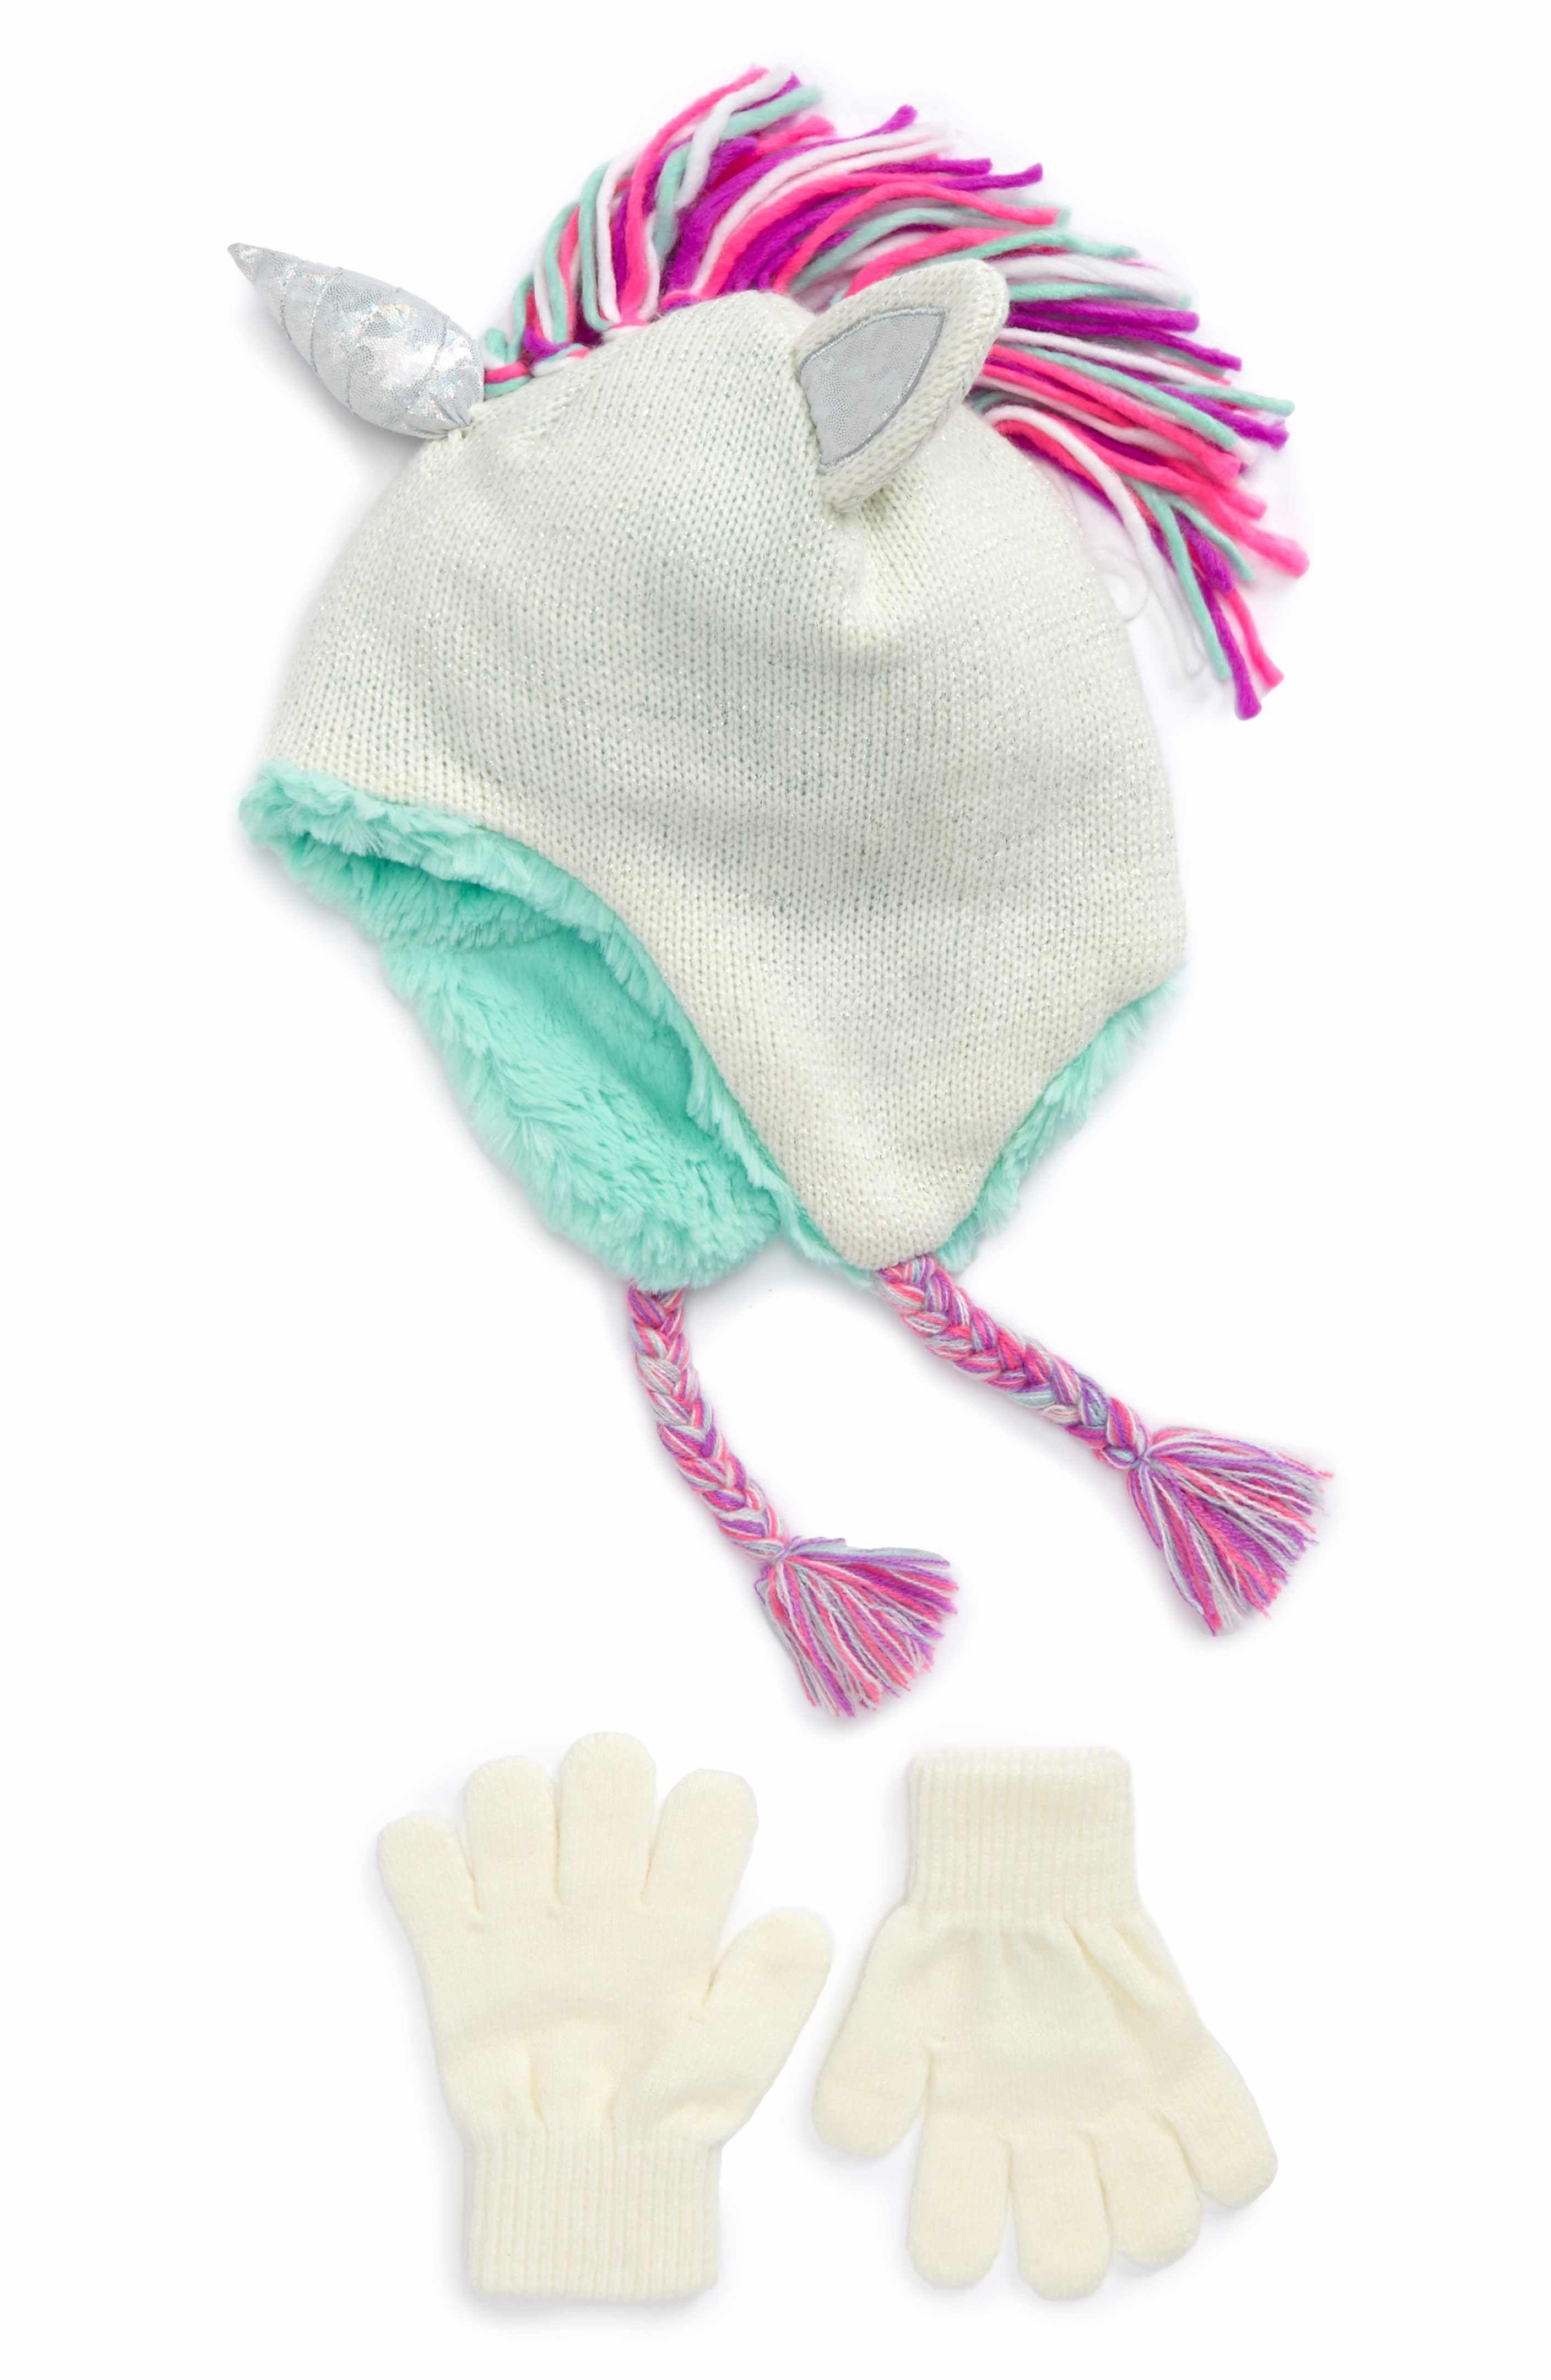 2a57a01f340 Main Image - Capelli of New York Unicorn Knit Hat   Gloves Set (Little  Girls   Big Girls)